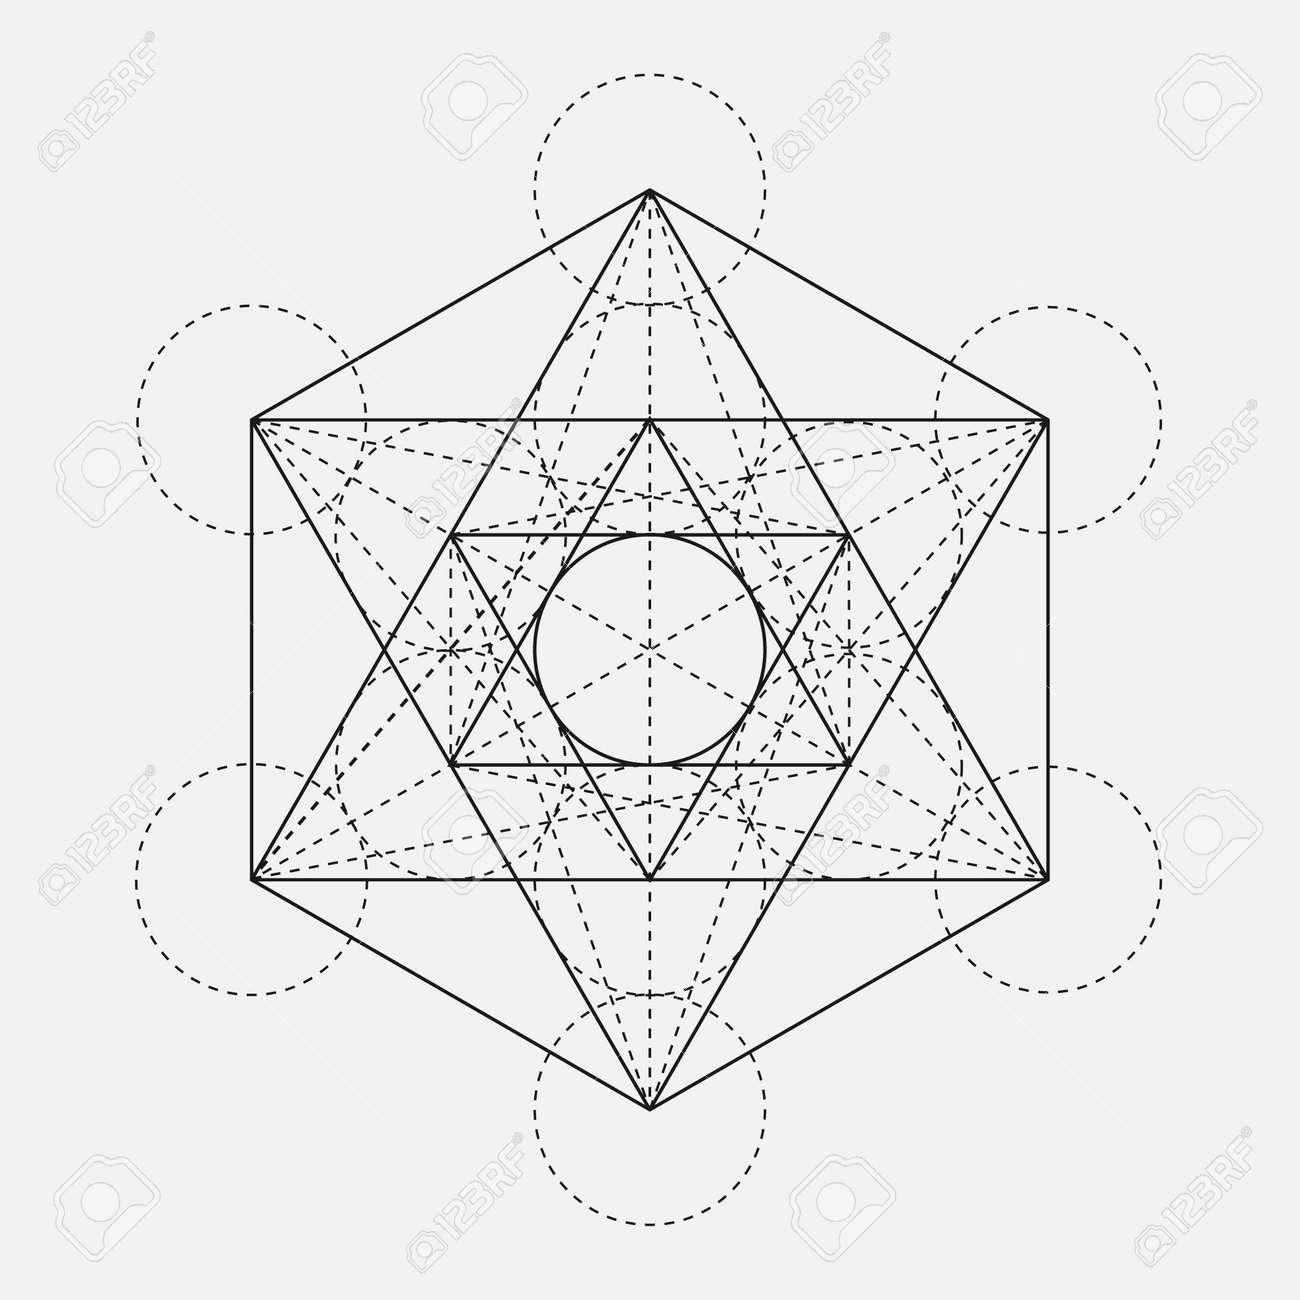 metatron s cube flower of life vector geometric symbol isolated